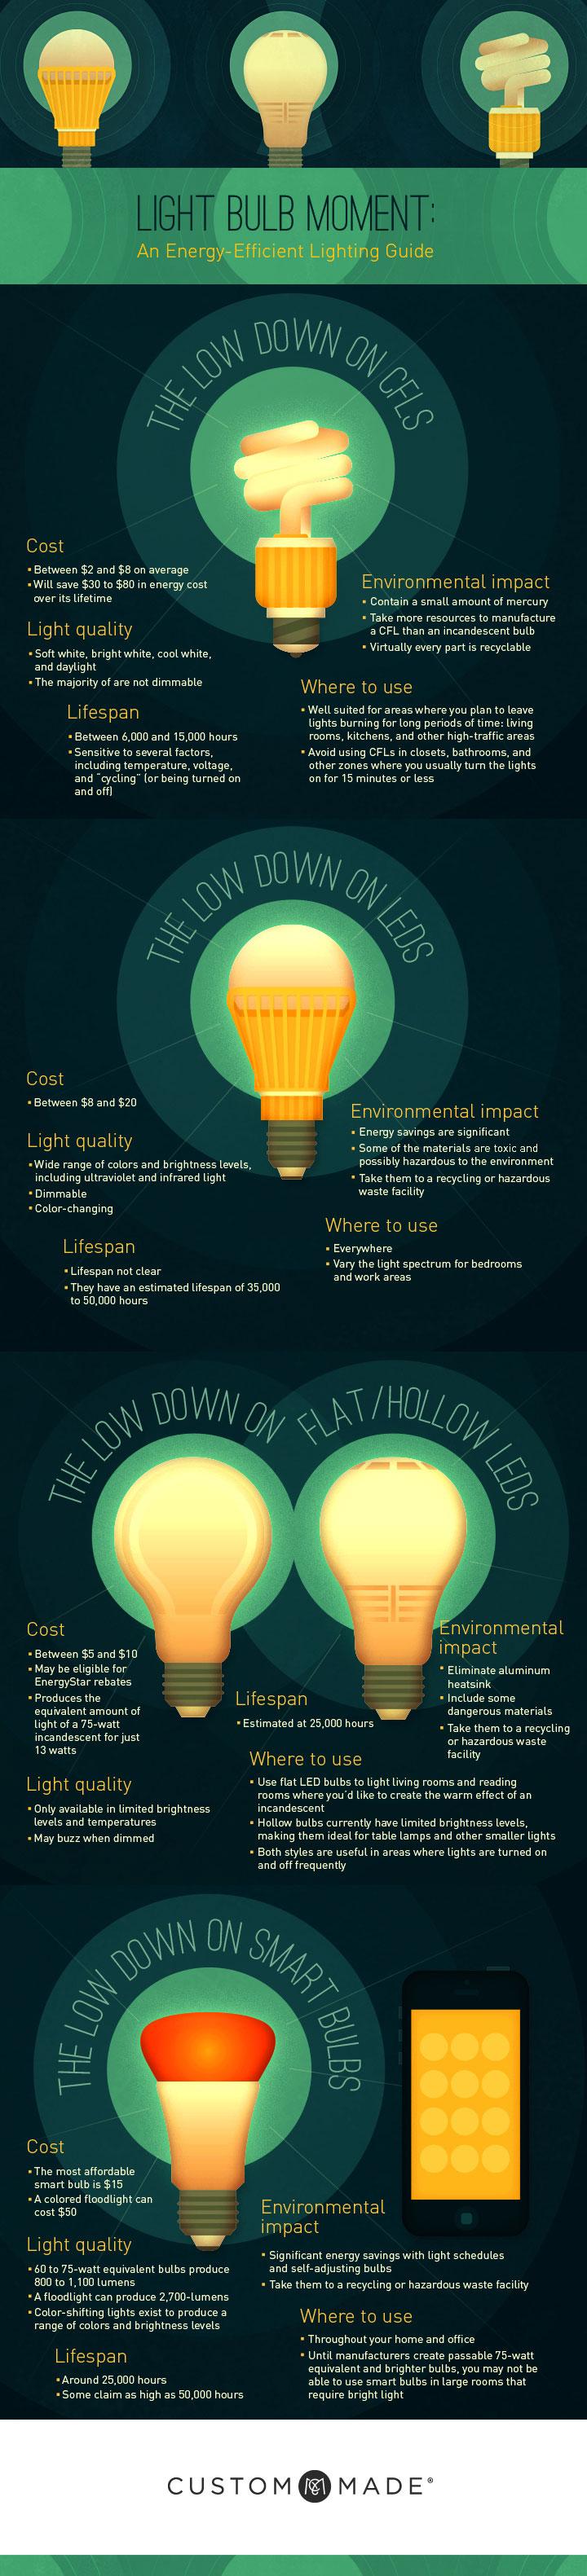 Light Bulb Moment: An Energy-Efficient Lighting Guide